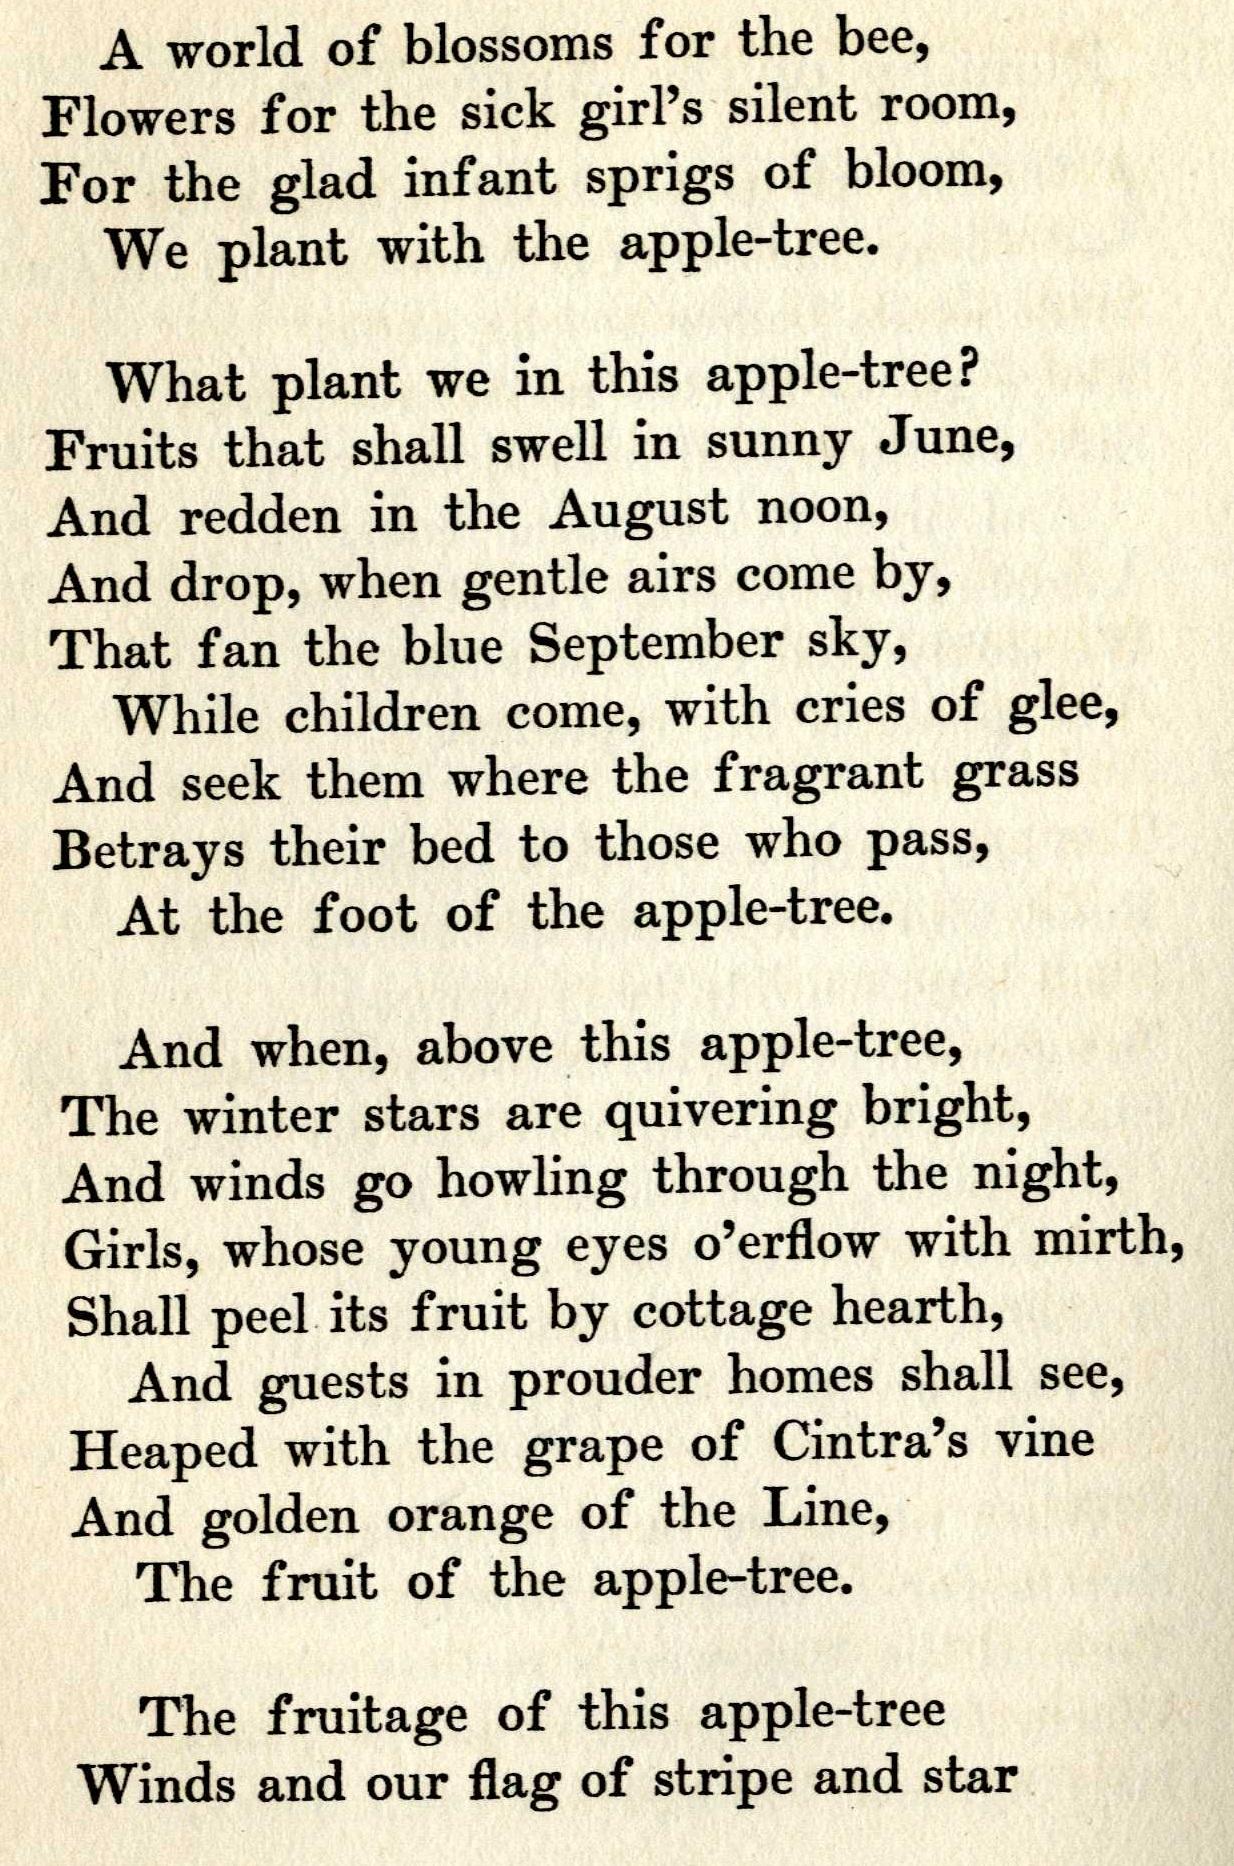 Garden Poetry: Poets & Verses inspired by Nature – Funk